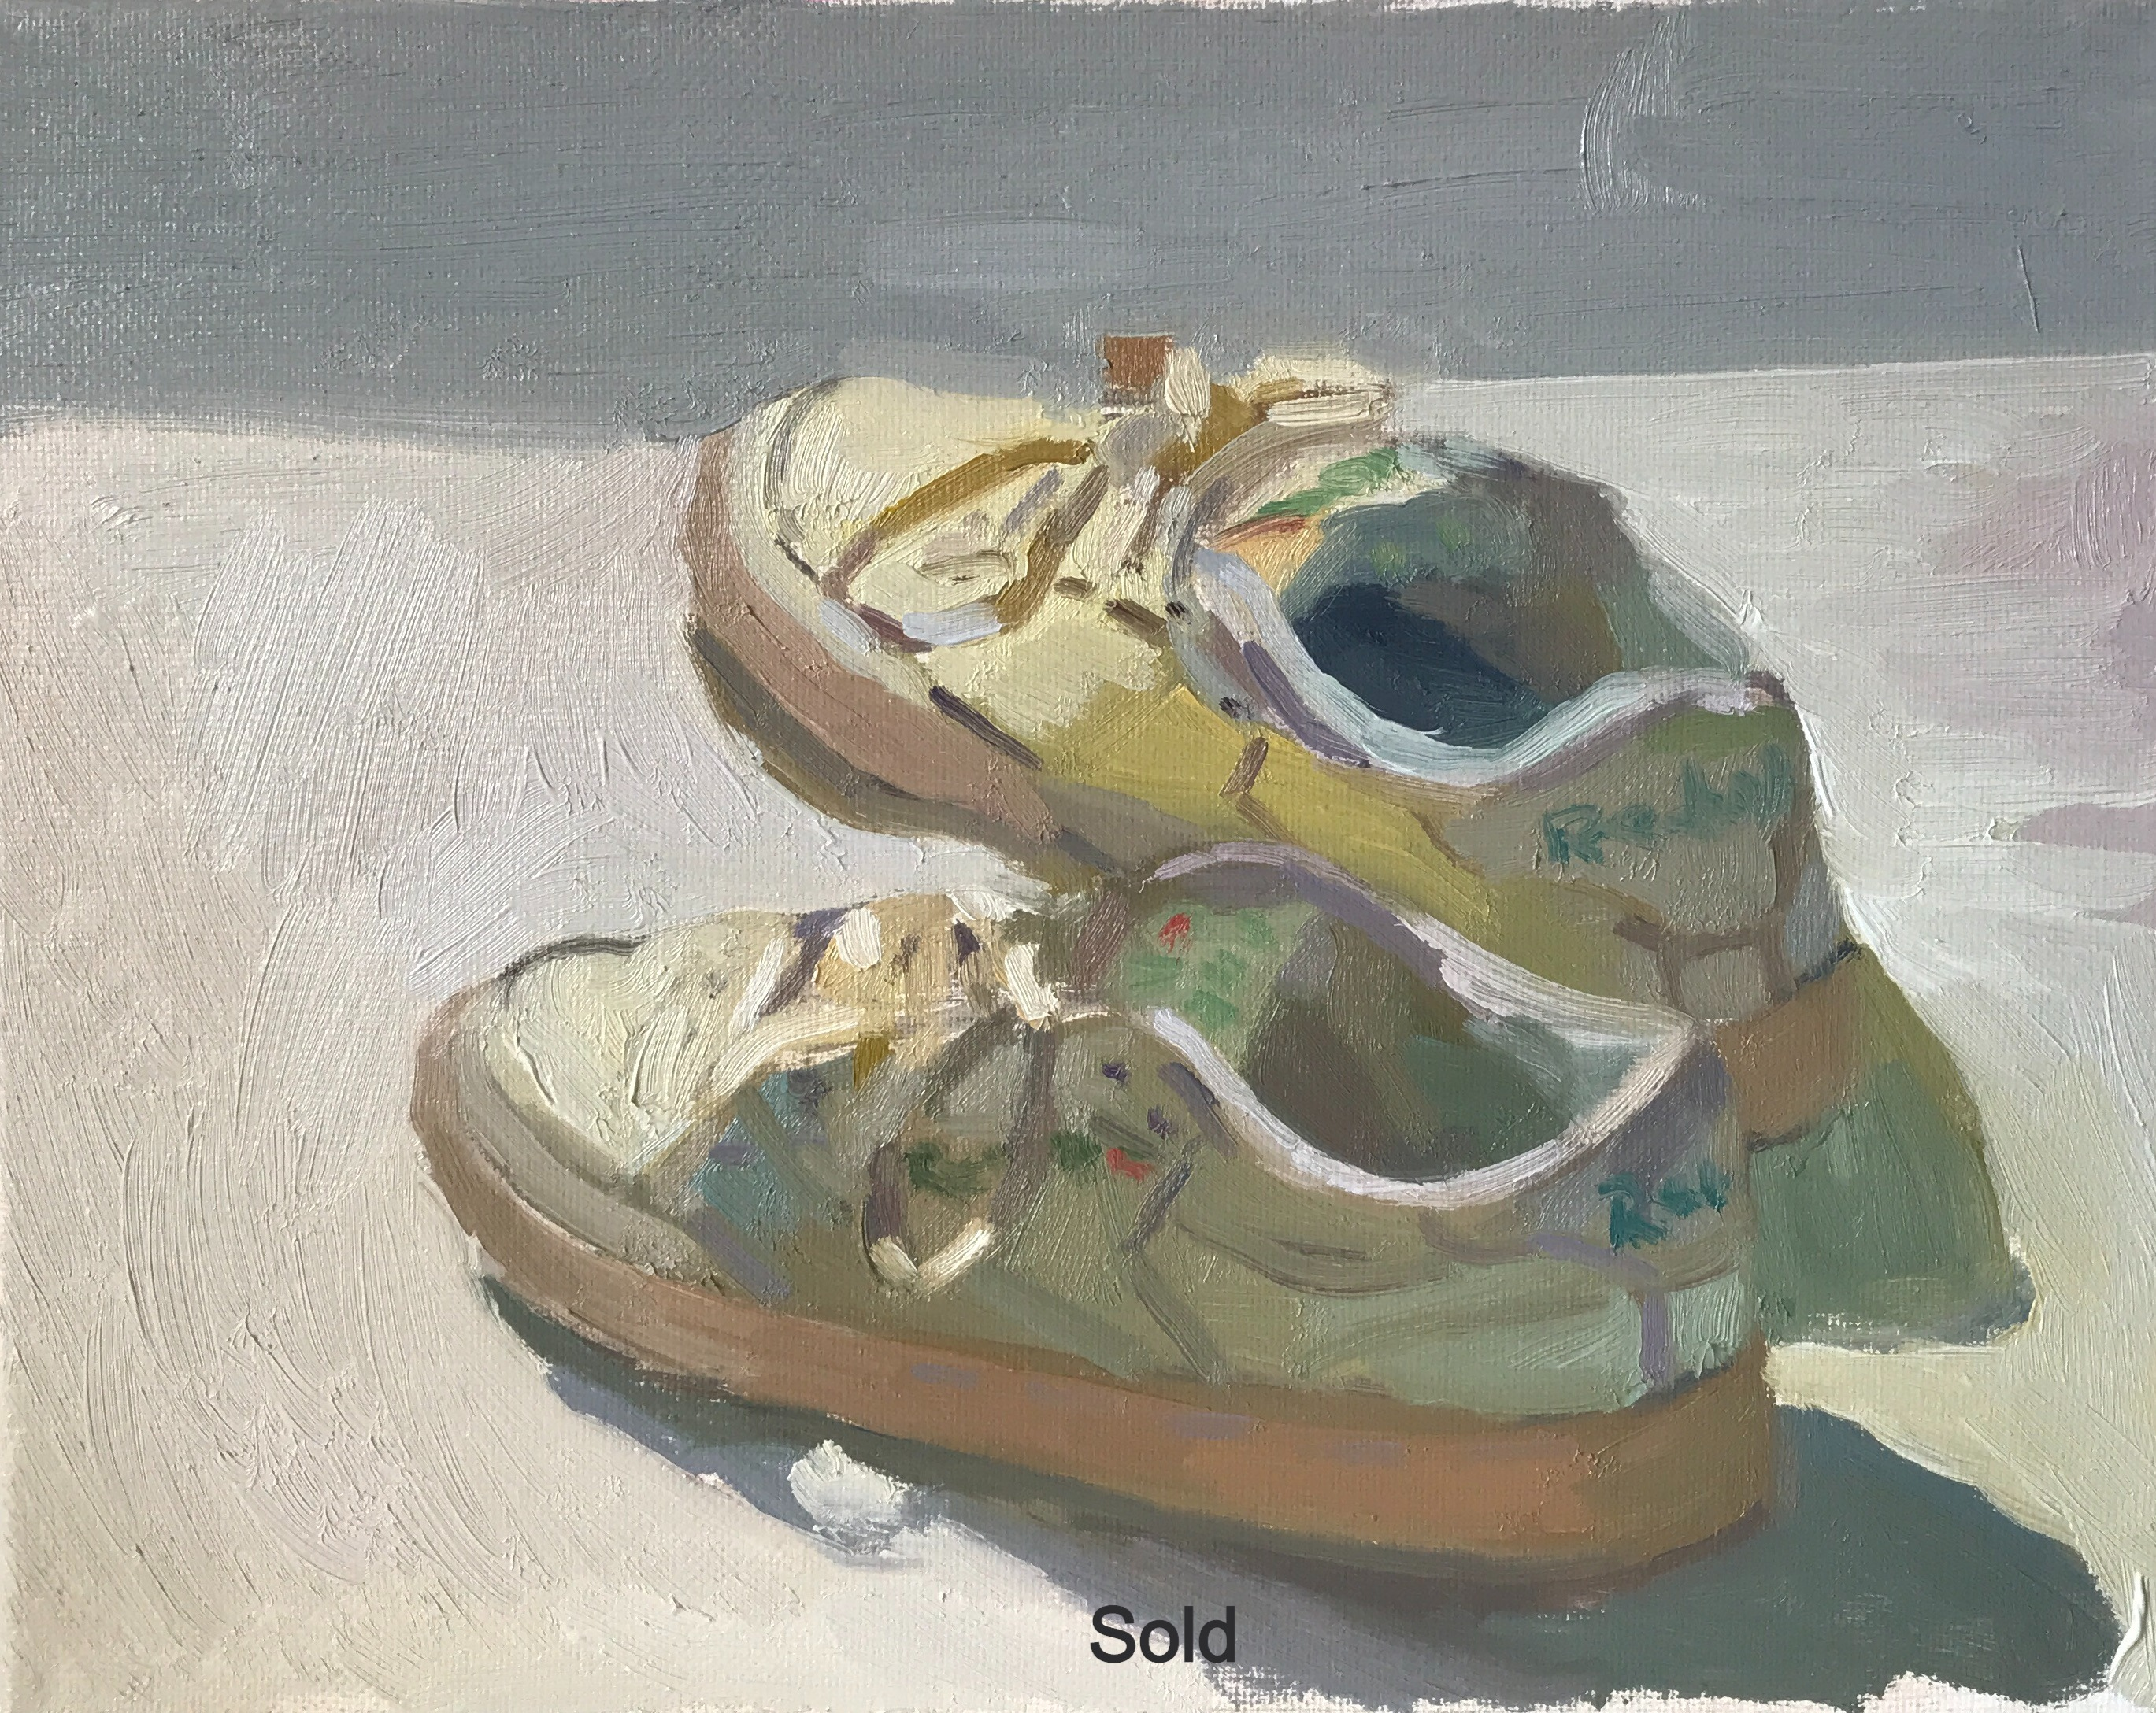 White pair of reebok shoes